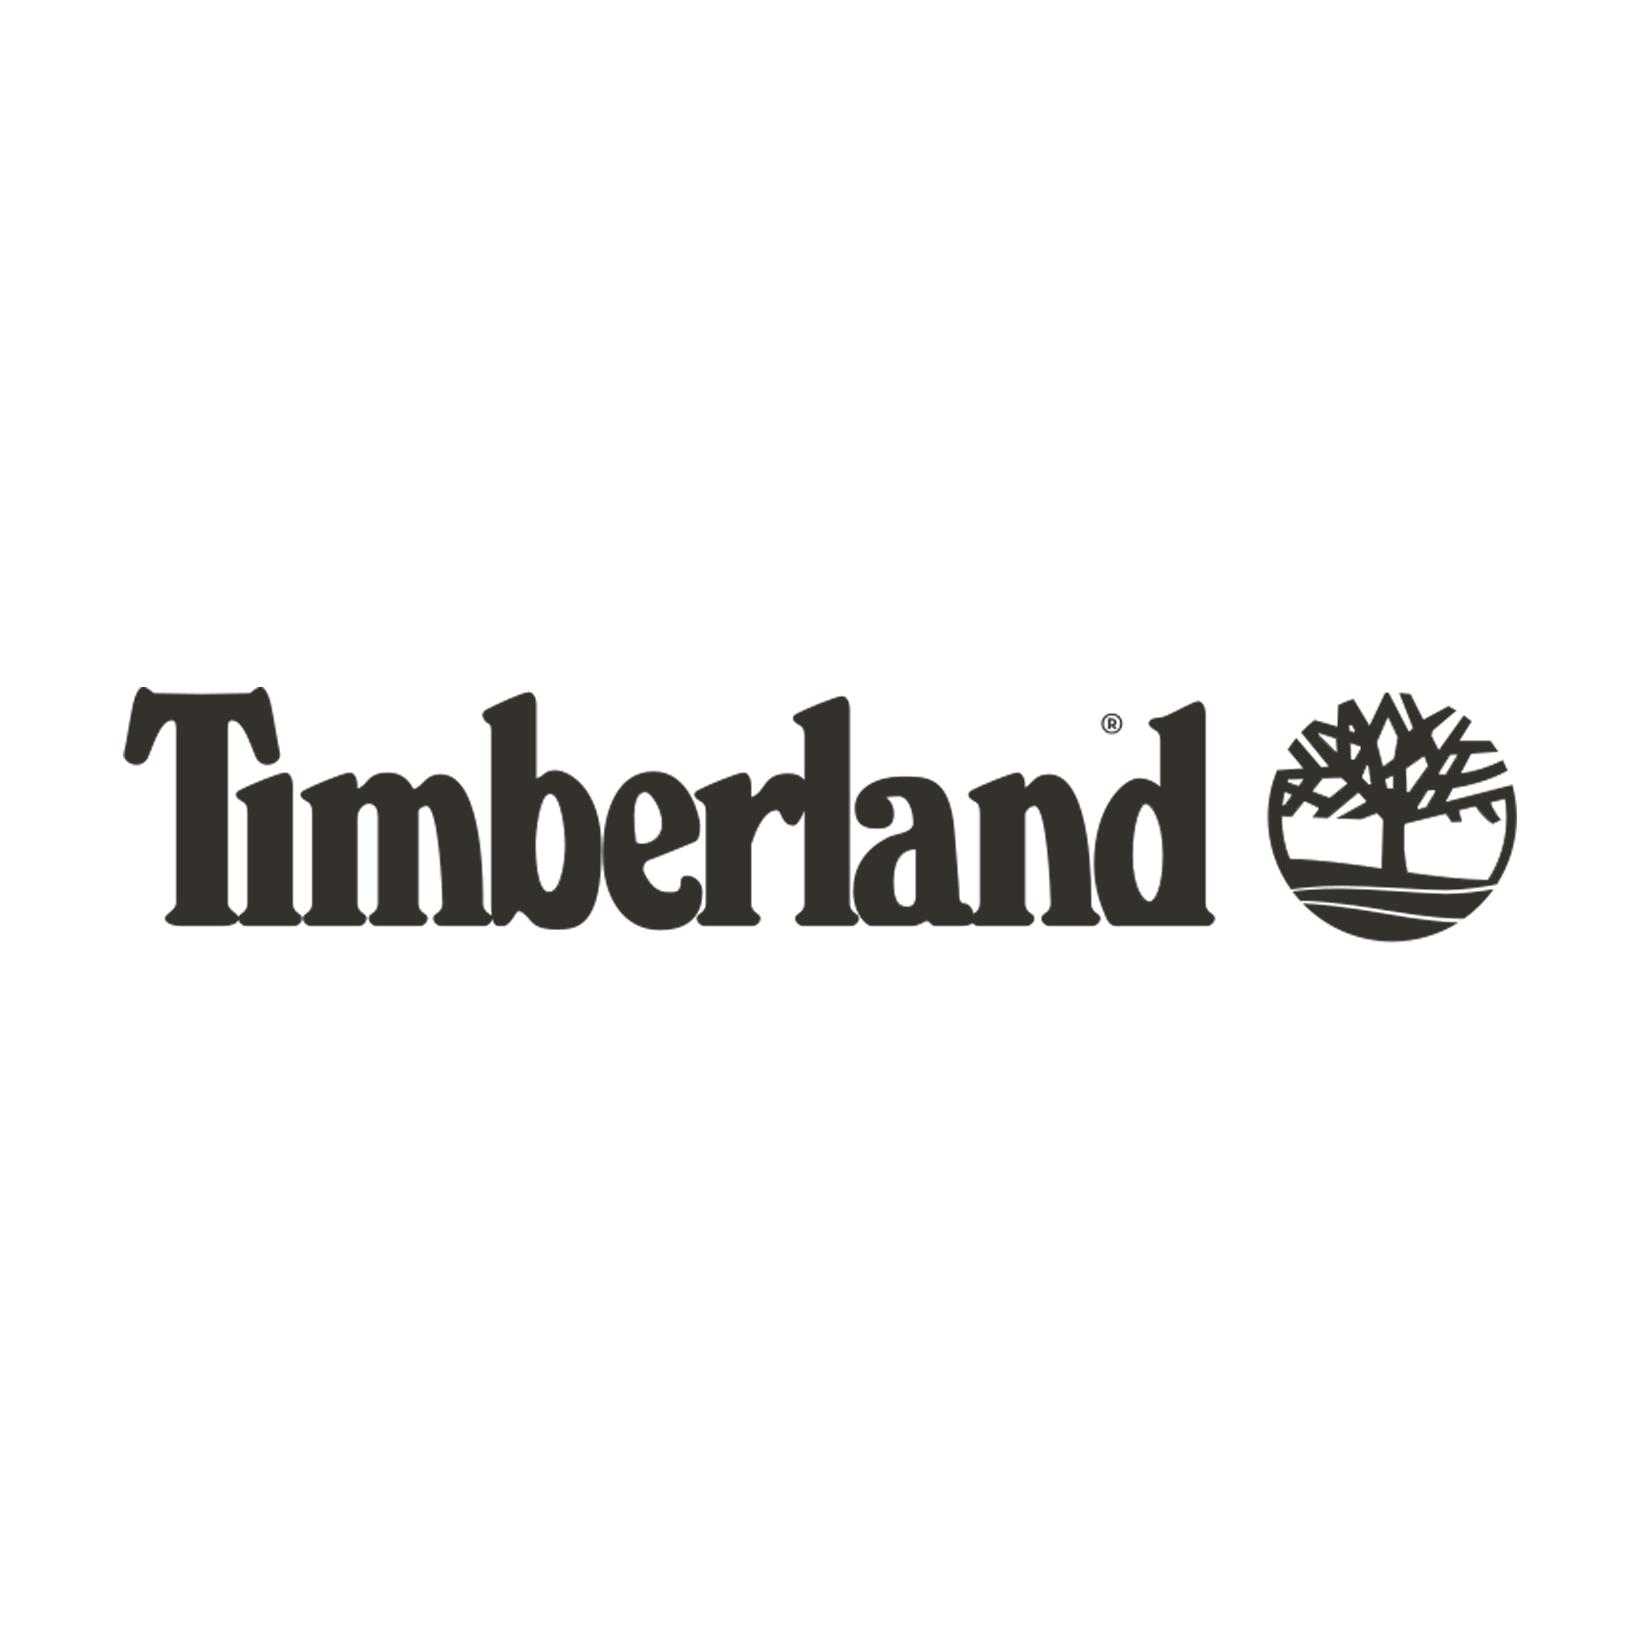 Timberland image 1